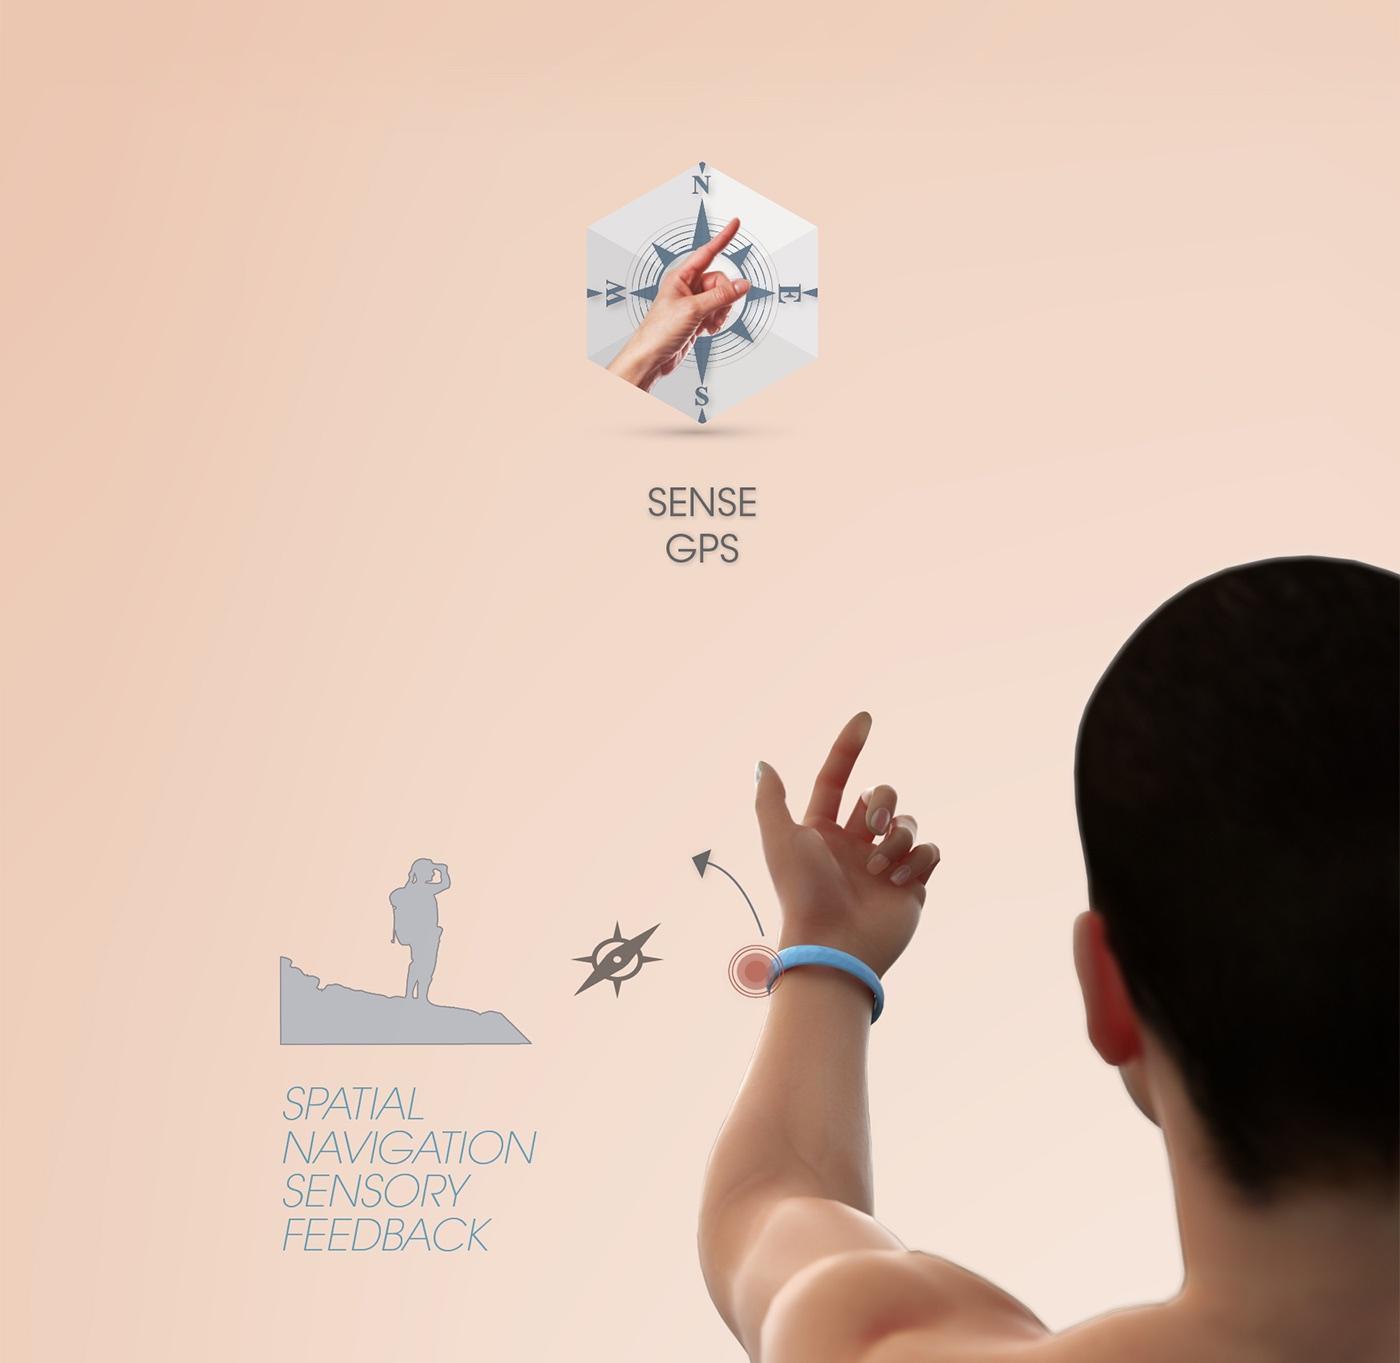 Jawbone EXO Ecosystem by Fabio Besti - Sensory GPS